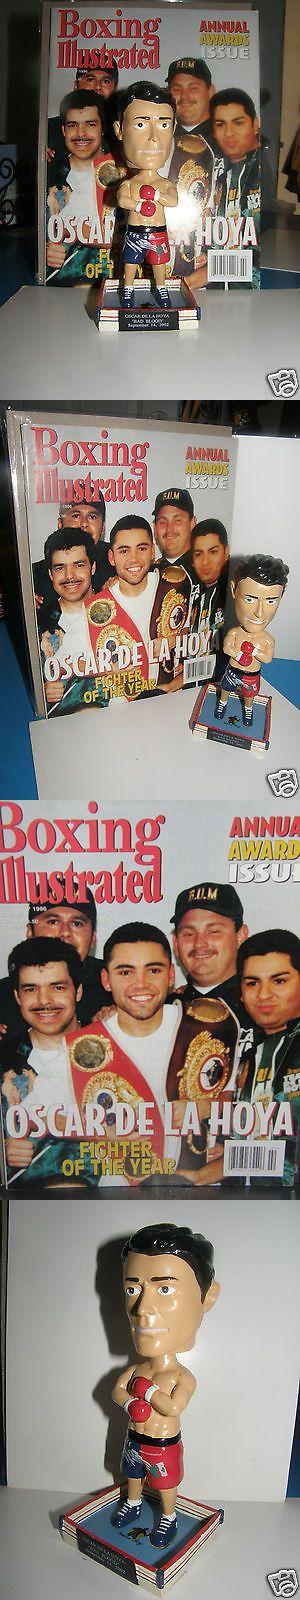 Bobble Heads 73424: Oscar De La Hoya Bobble-Head And1996 Nostalgic Magazine Golden-Boy Trade-Mark -> BUY IT NOW ONLY: $75 on eBay!